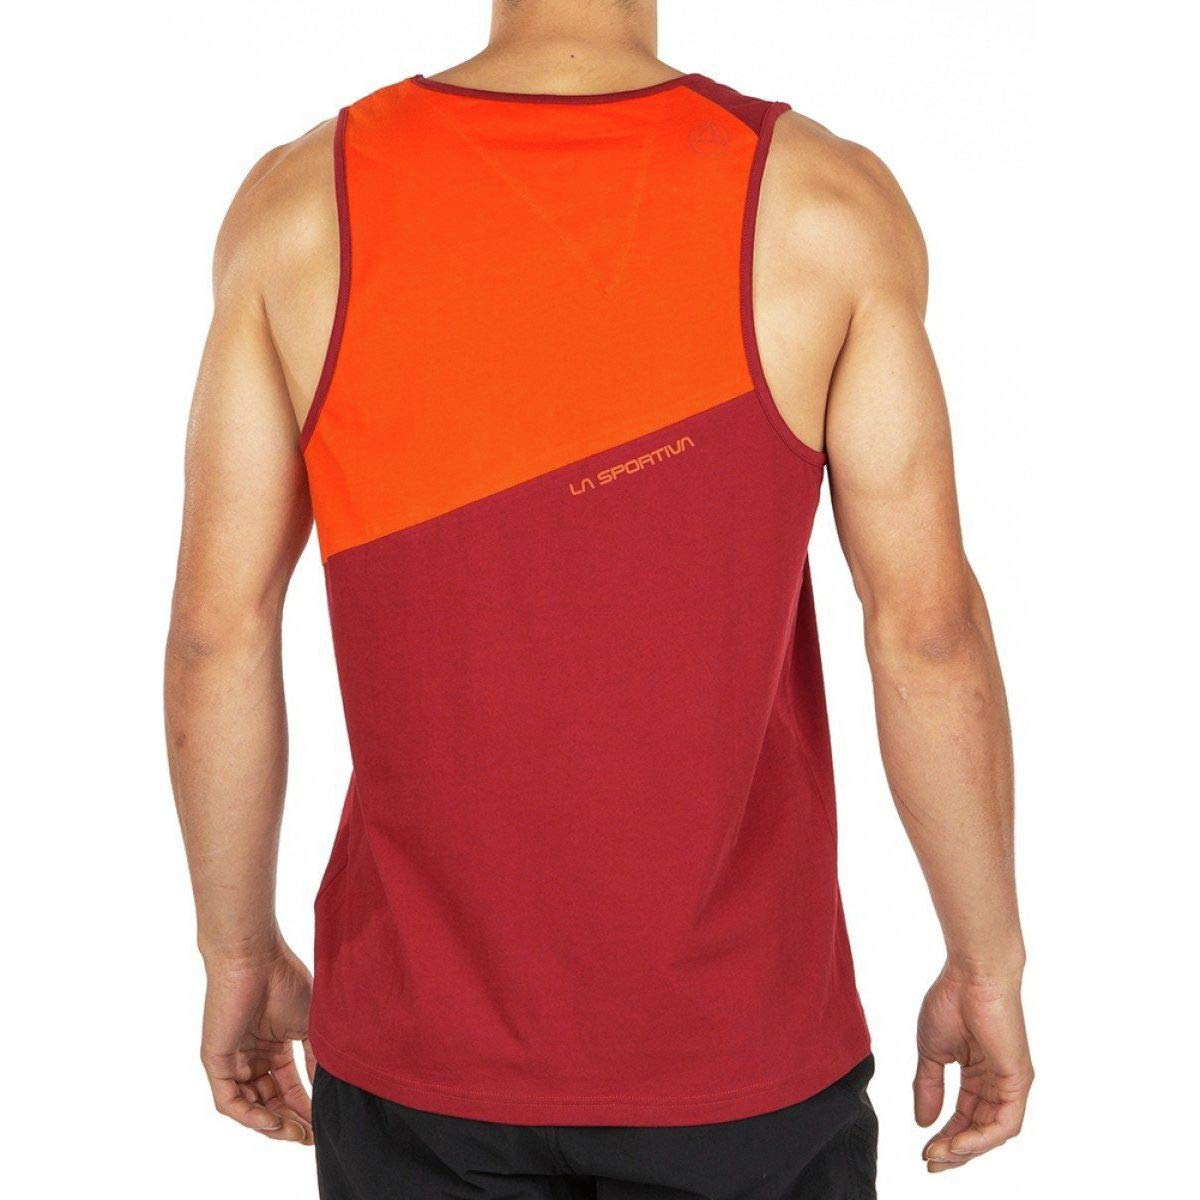 aafe896a694e25 Amazon.com  La Sportiva Men s Dude Tank  Clothing